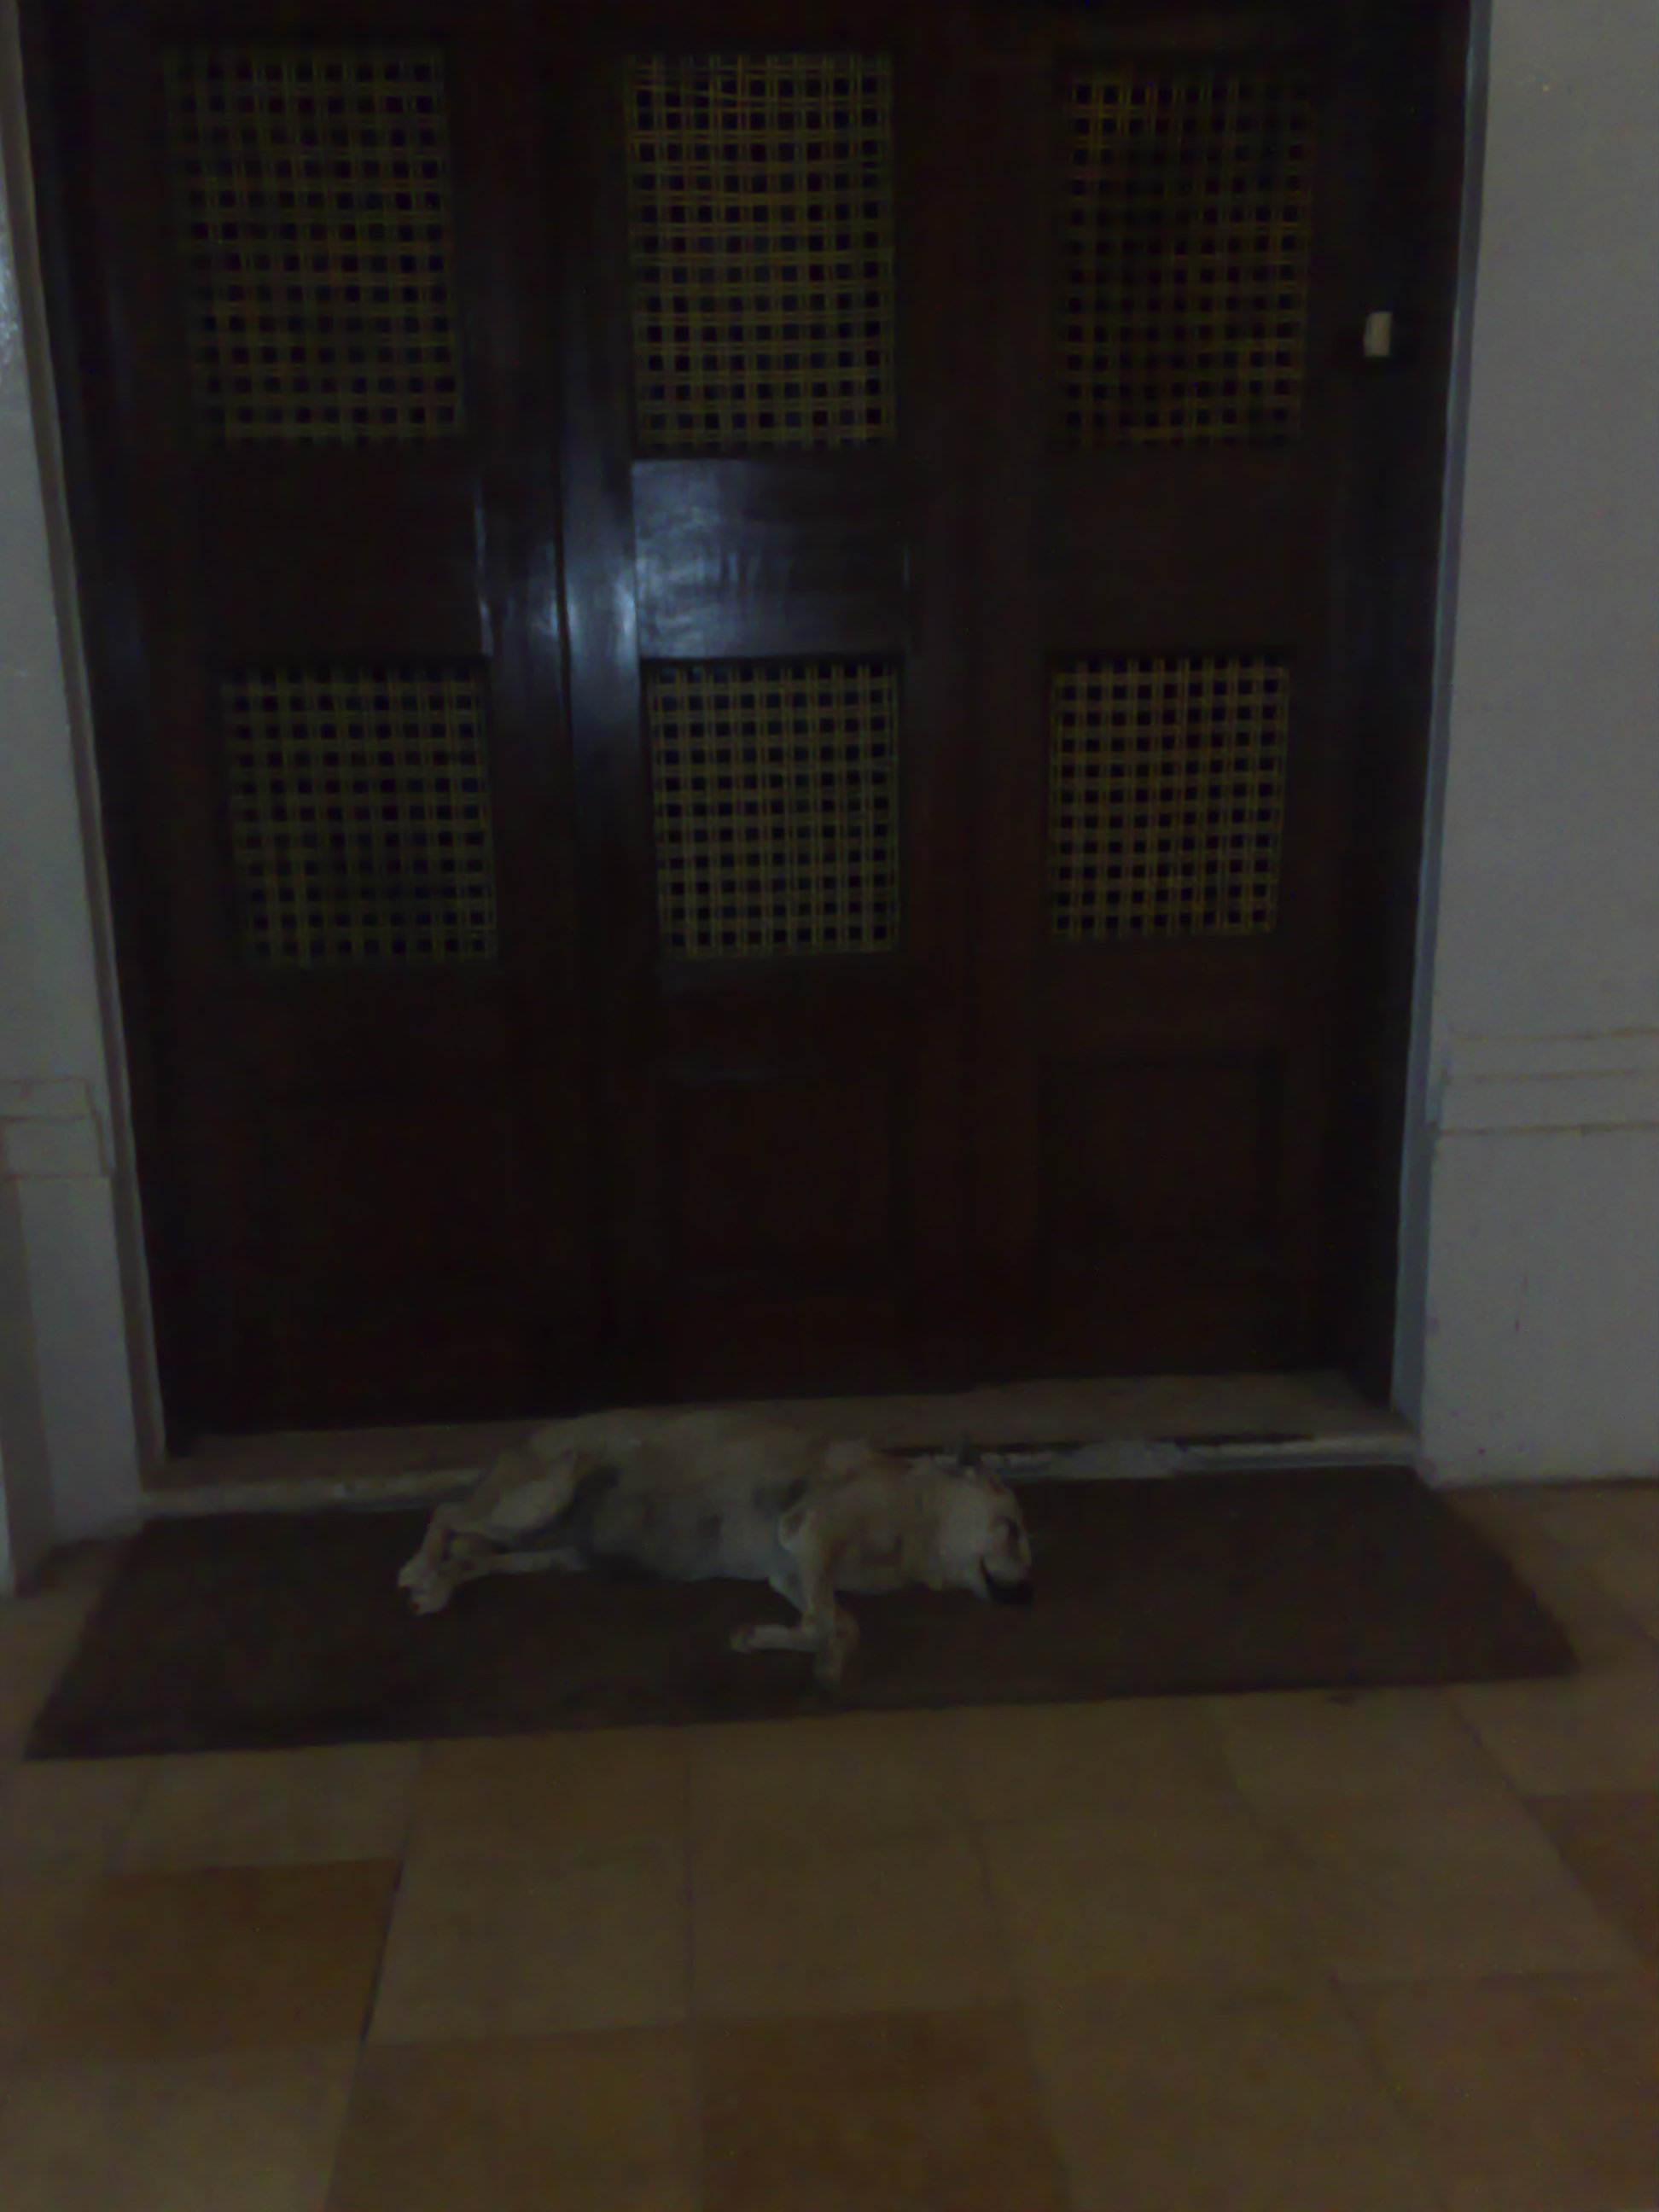 Sleeping Dogs Configuration